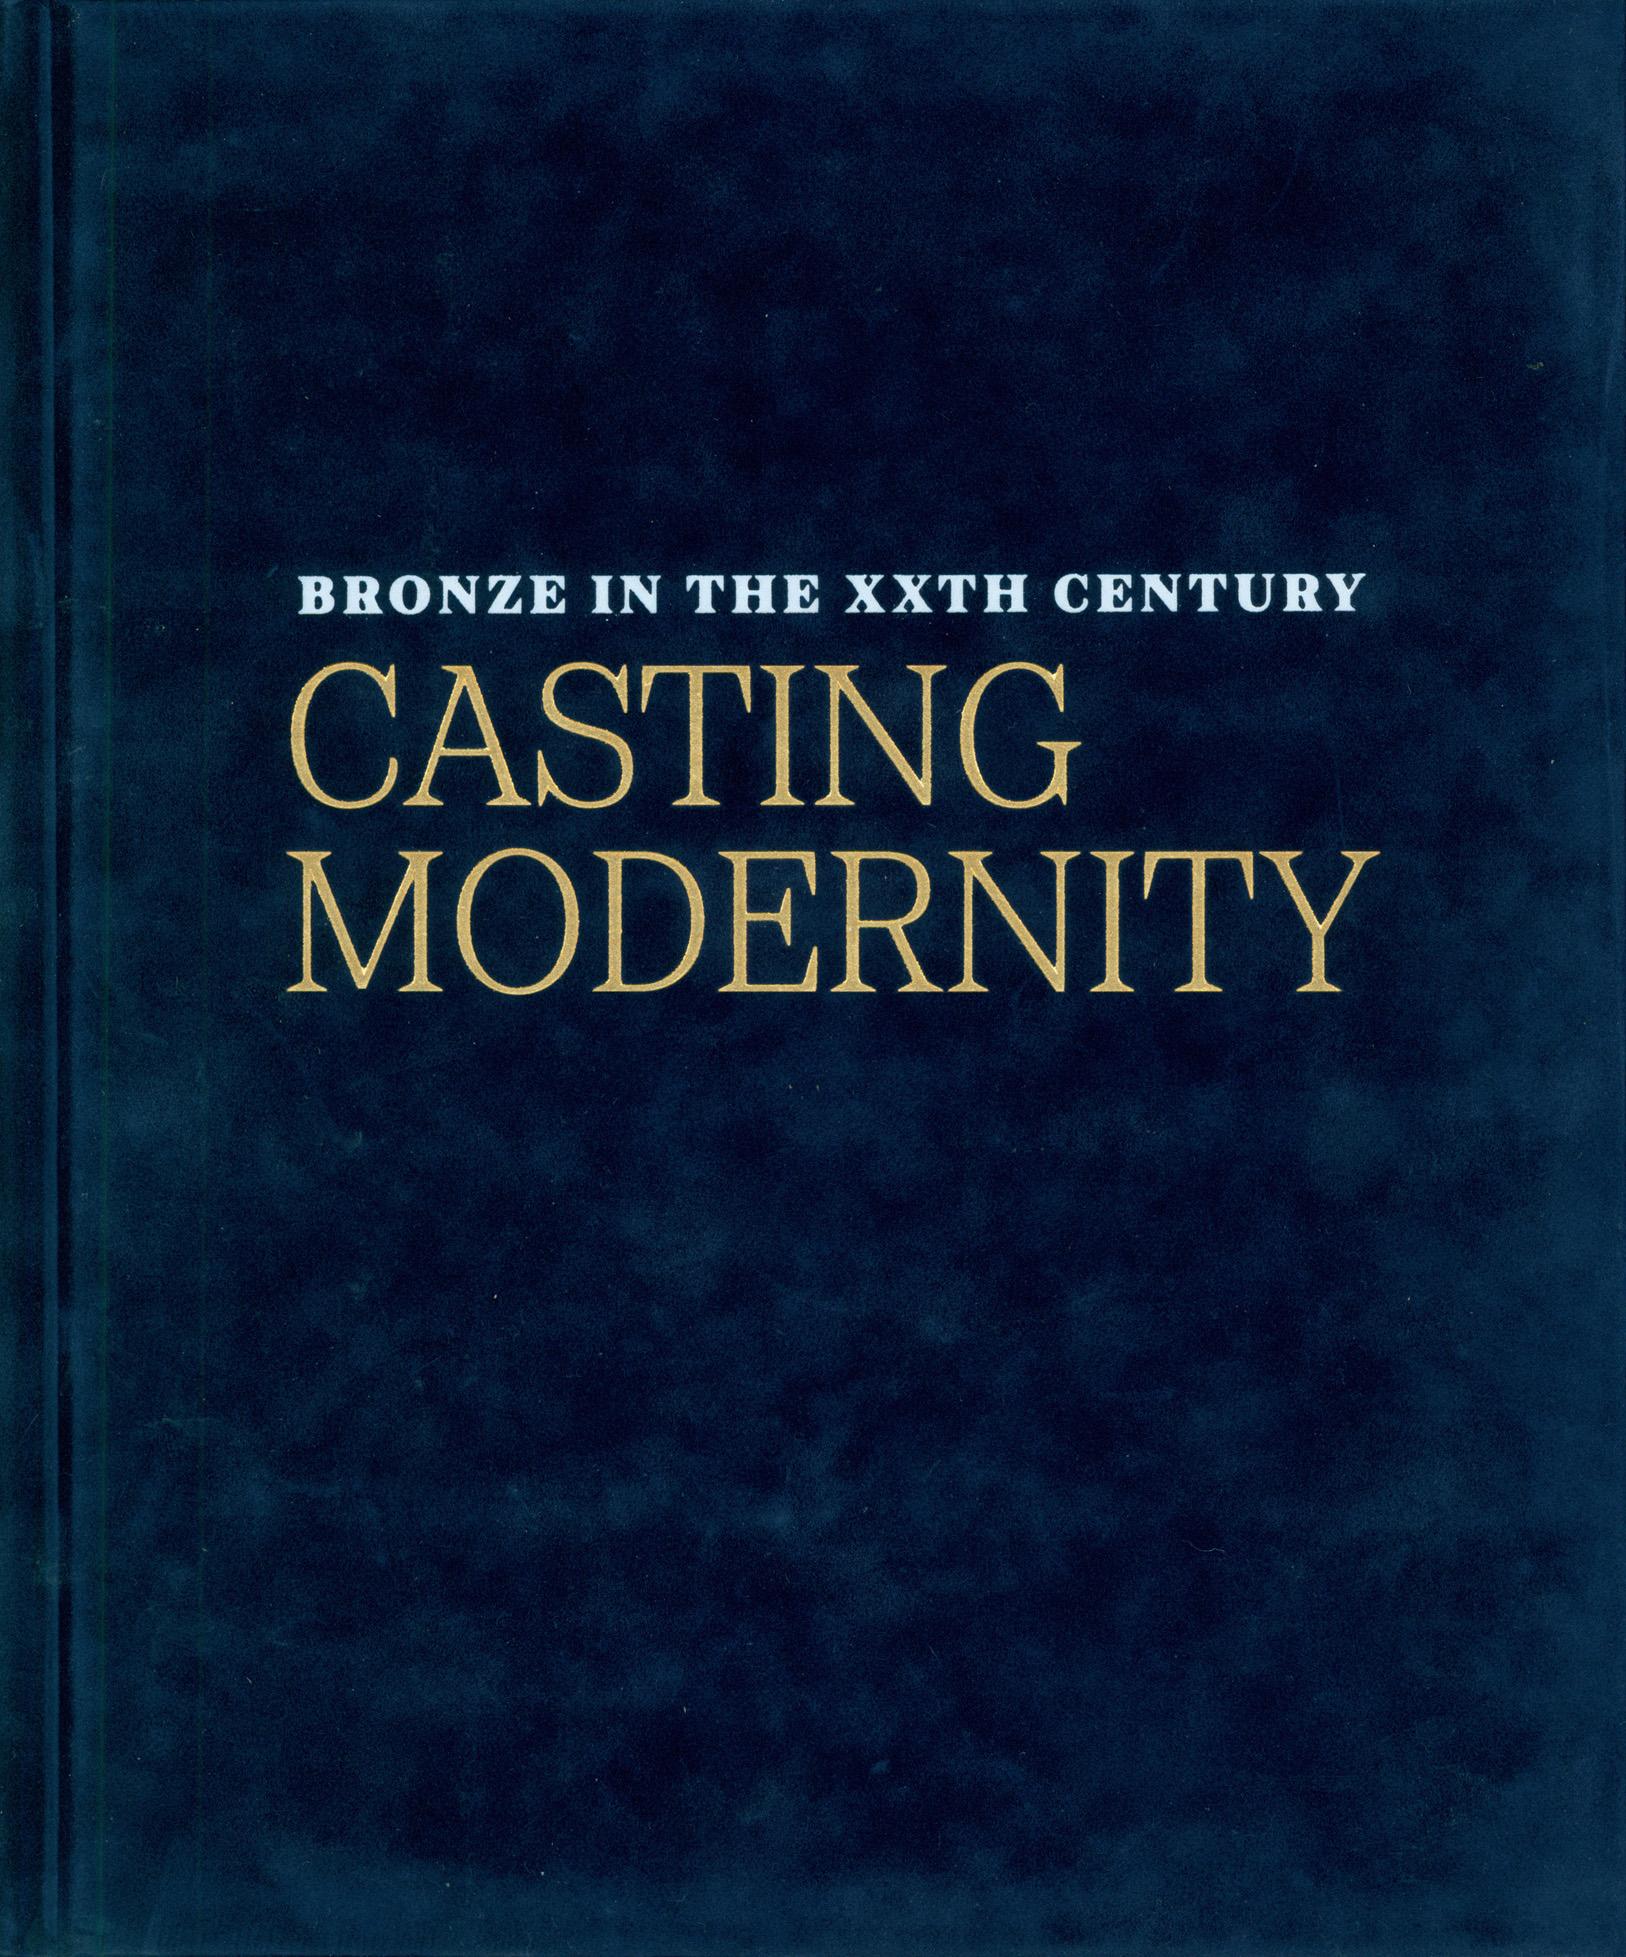 MNU_CastingModernity_2014.jpg